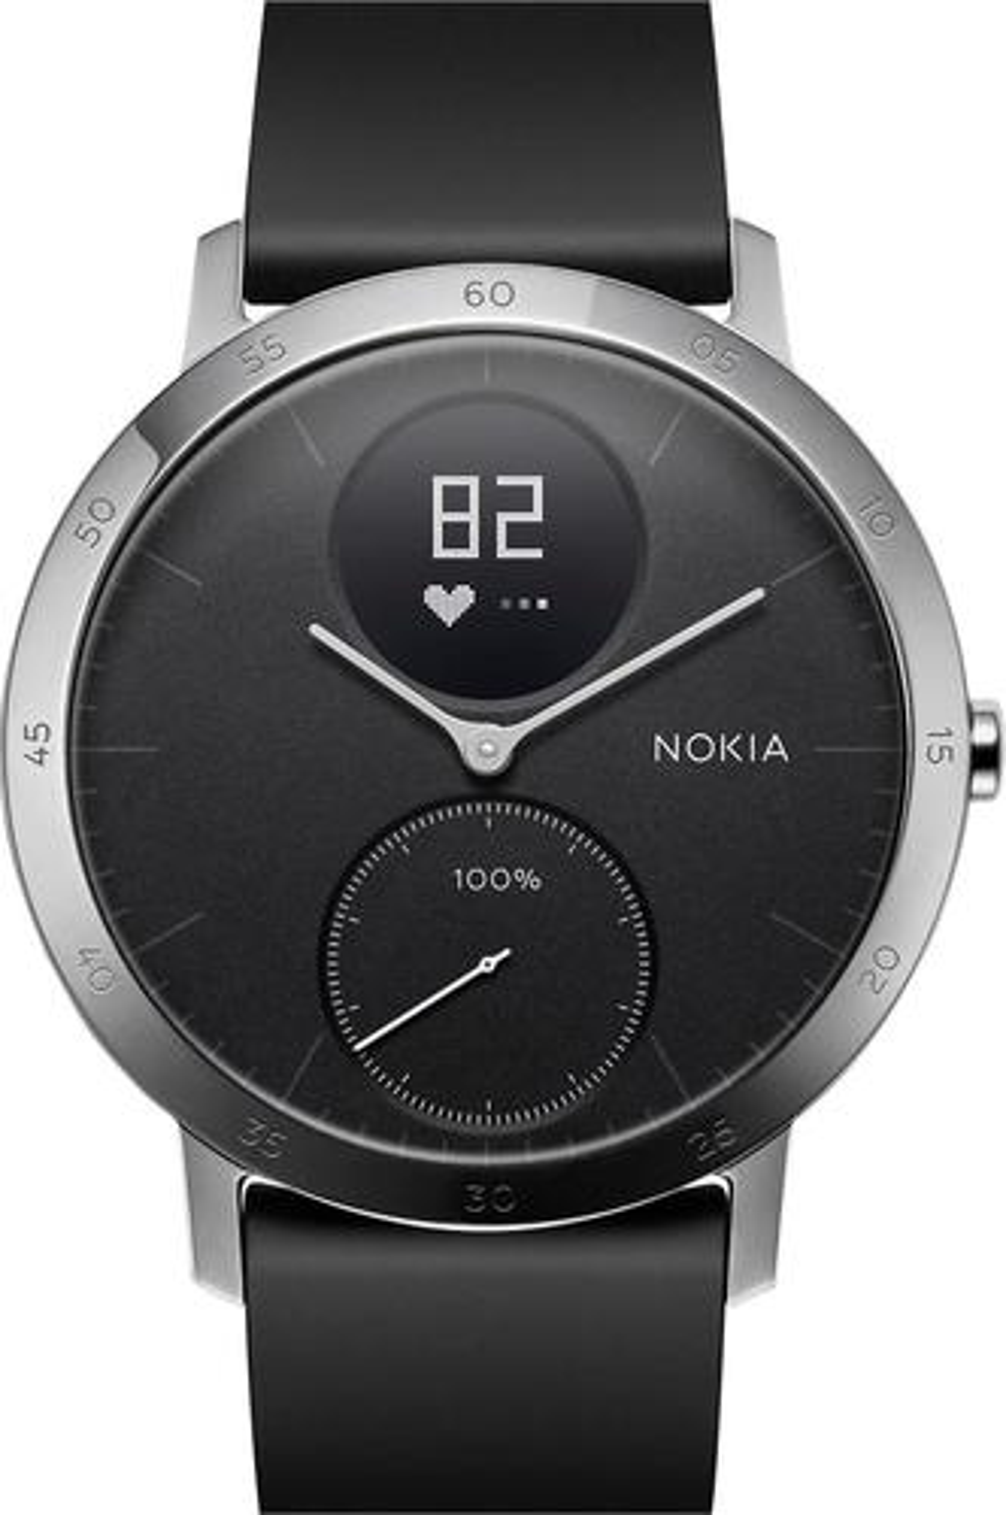 Nokia - Steel HR Activity Tracker + Heart Rate - Silver